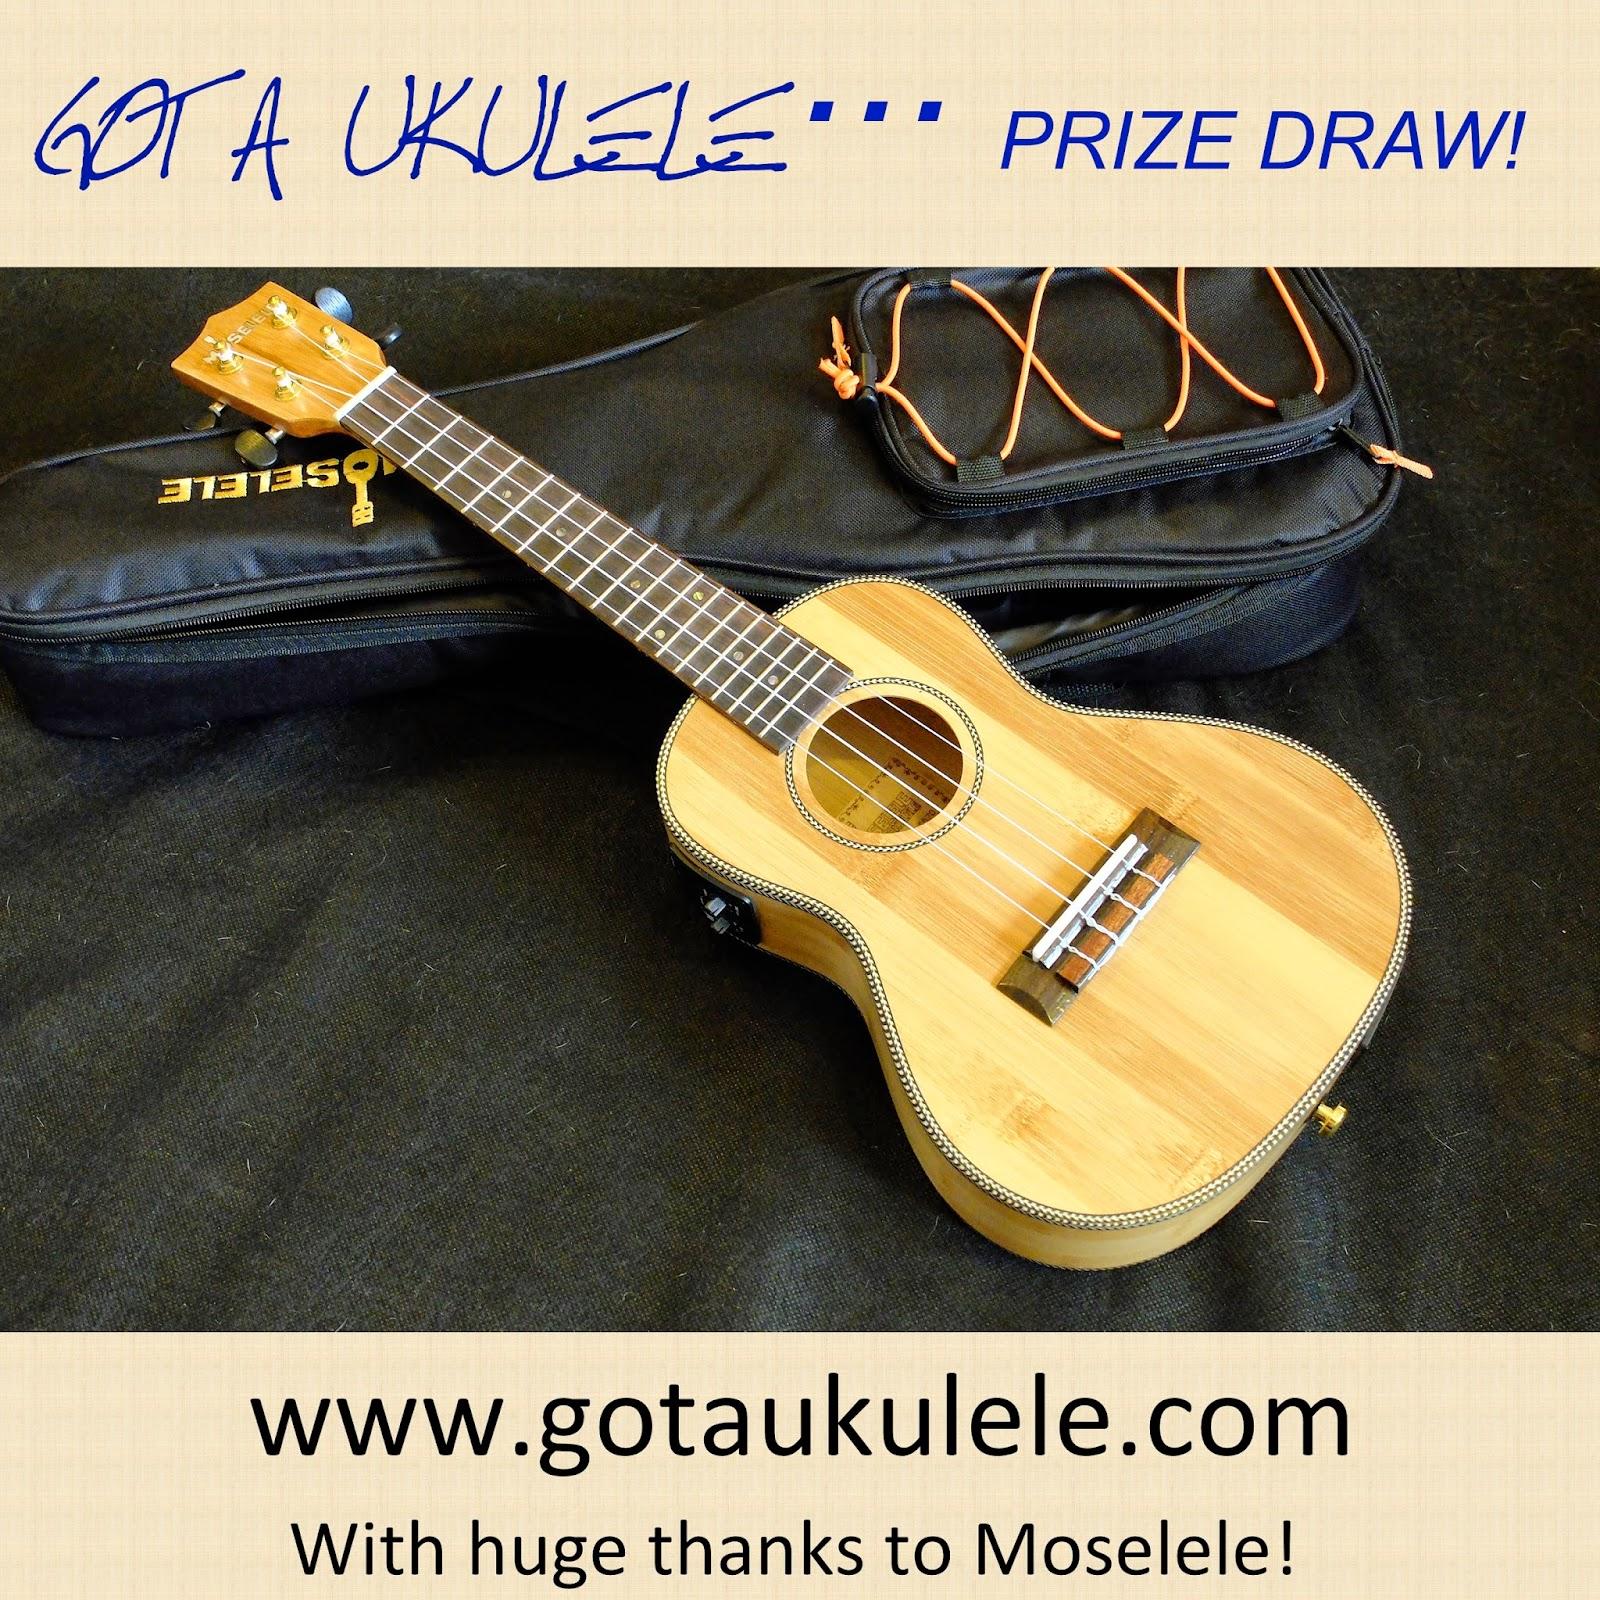 Moselele ukulele giveaway